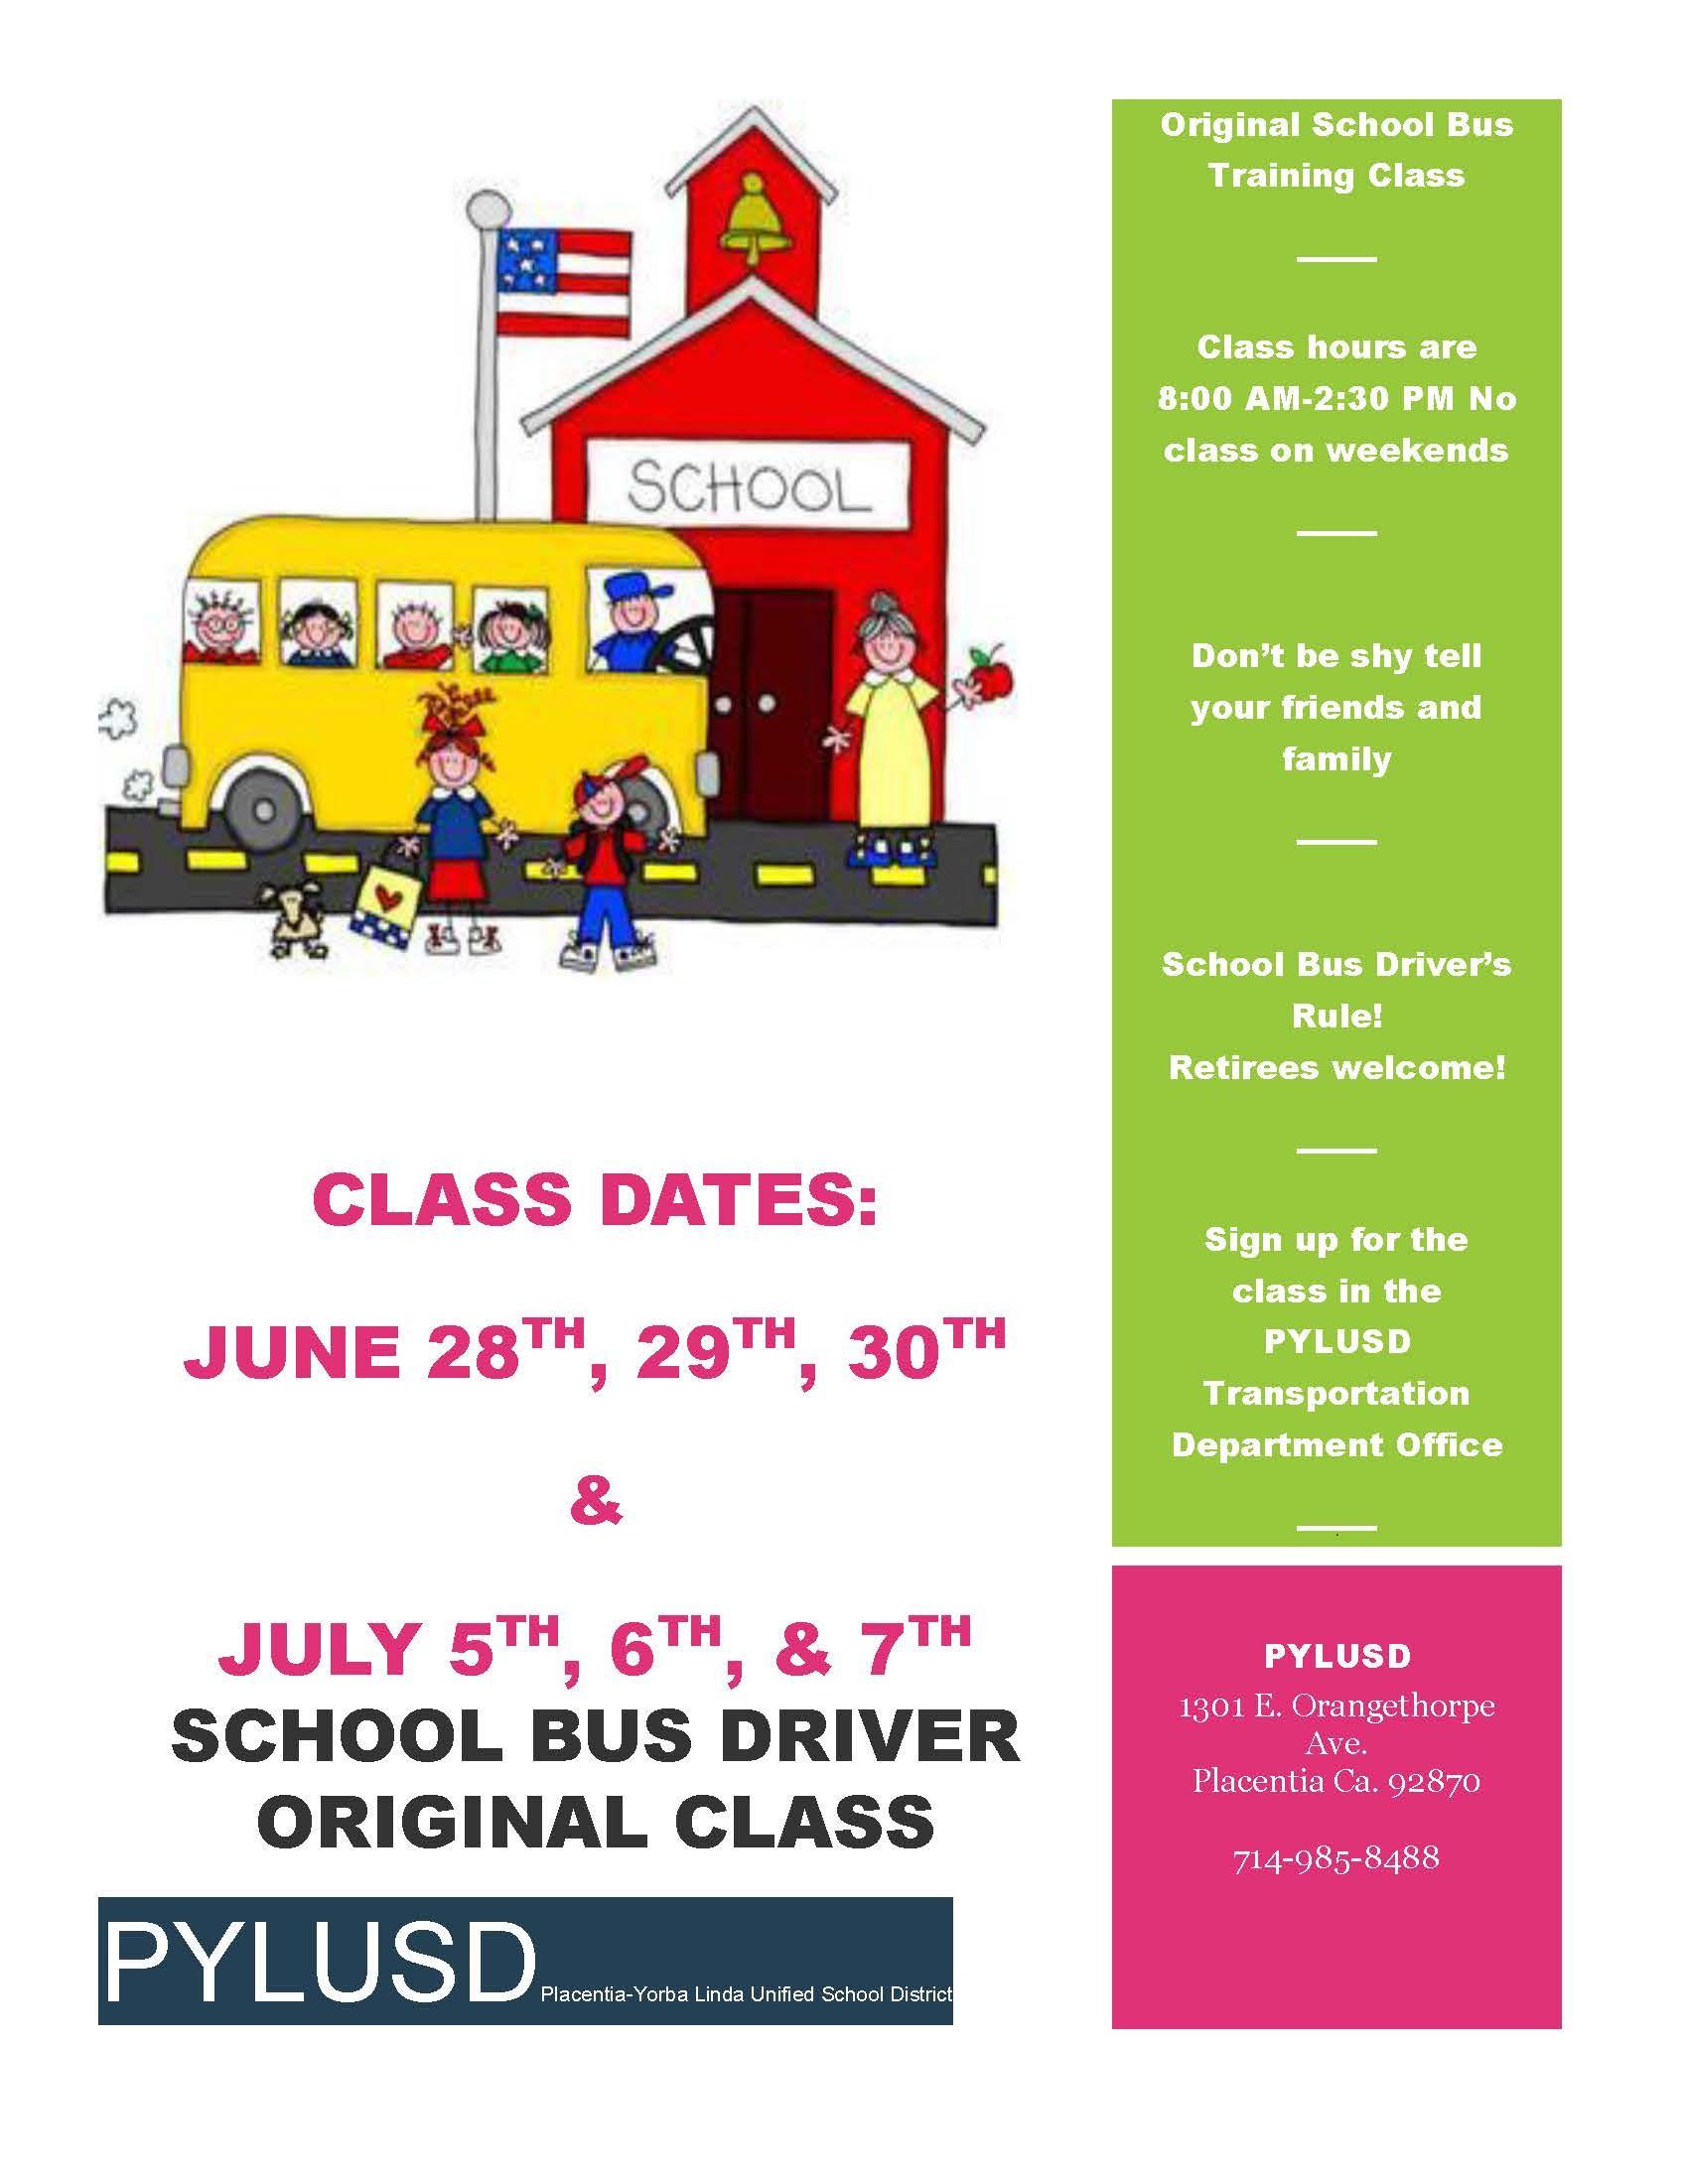 School Bus Driver Original Class Flyer